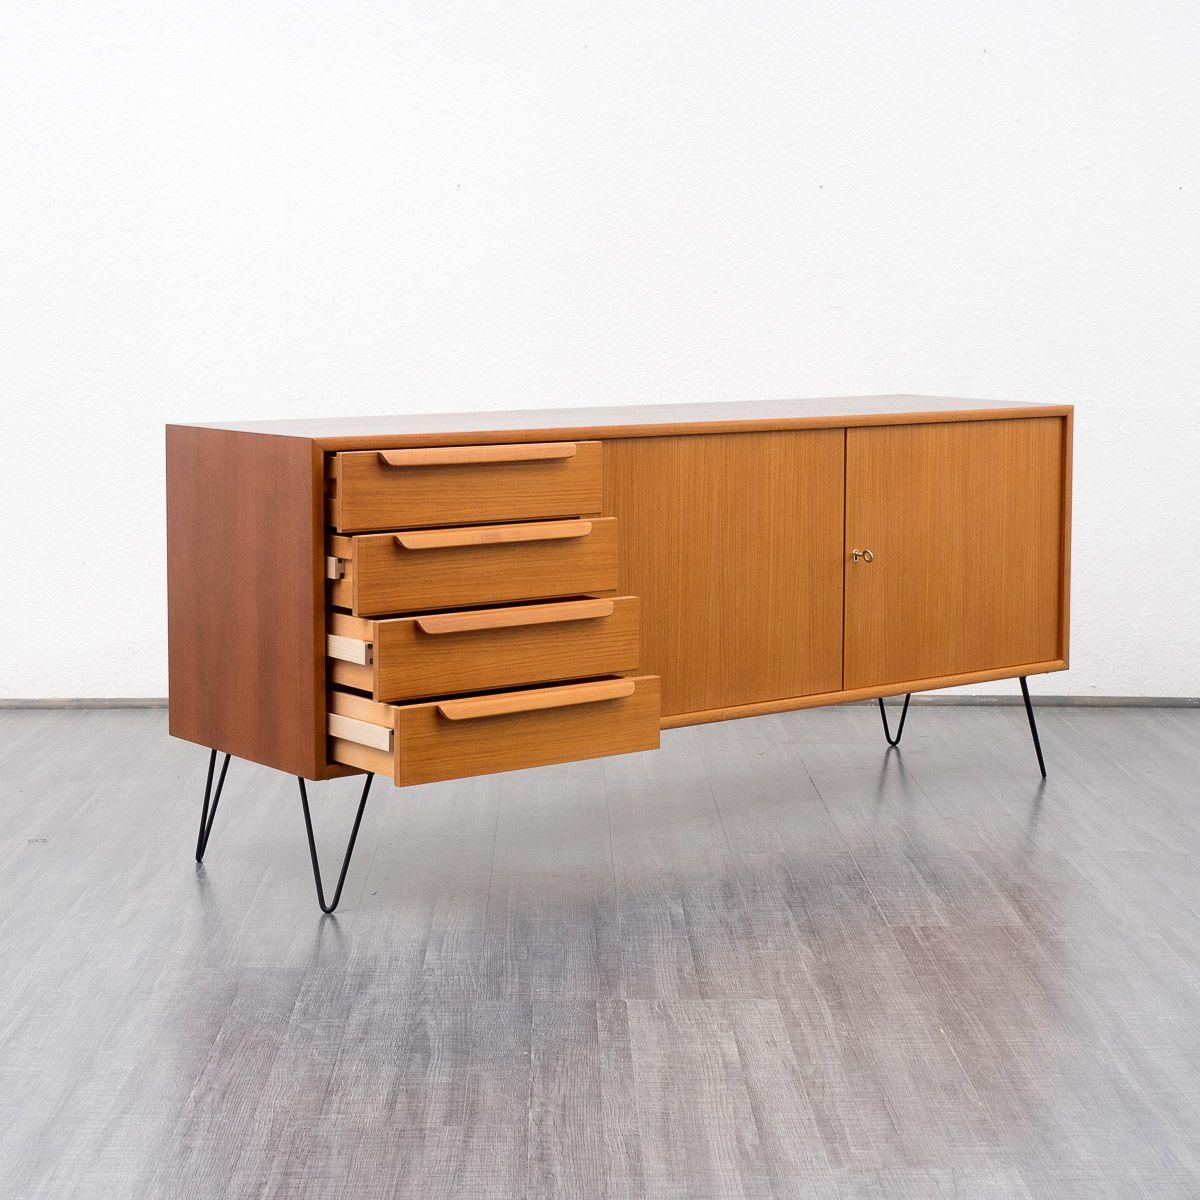 Teak sideboard mit metallf en von wk mobel 1960er bei for Vintage mobel sideboard